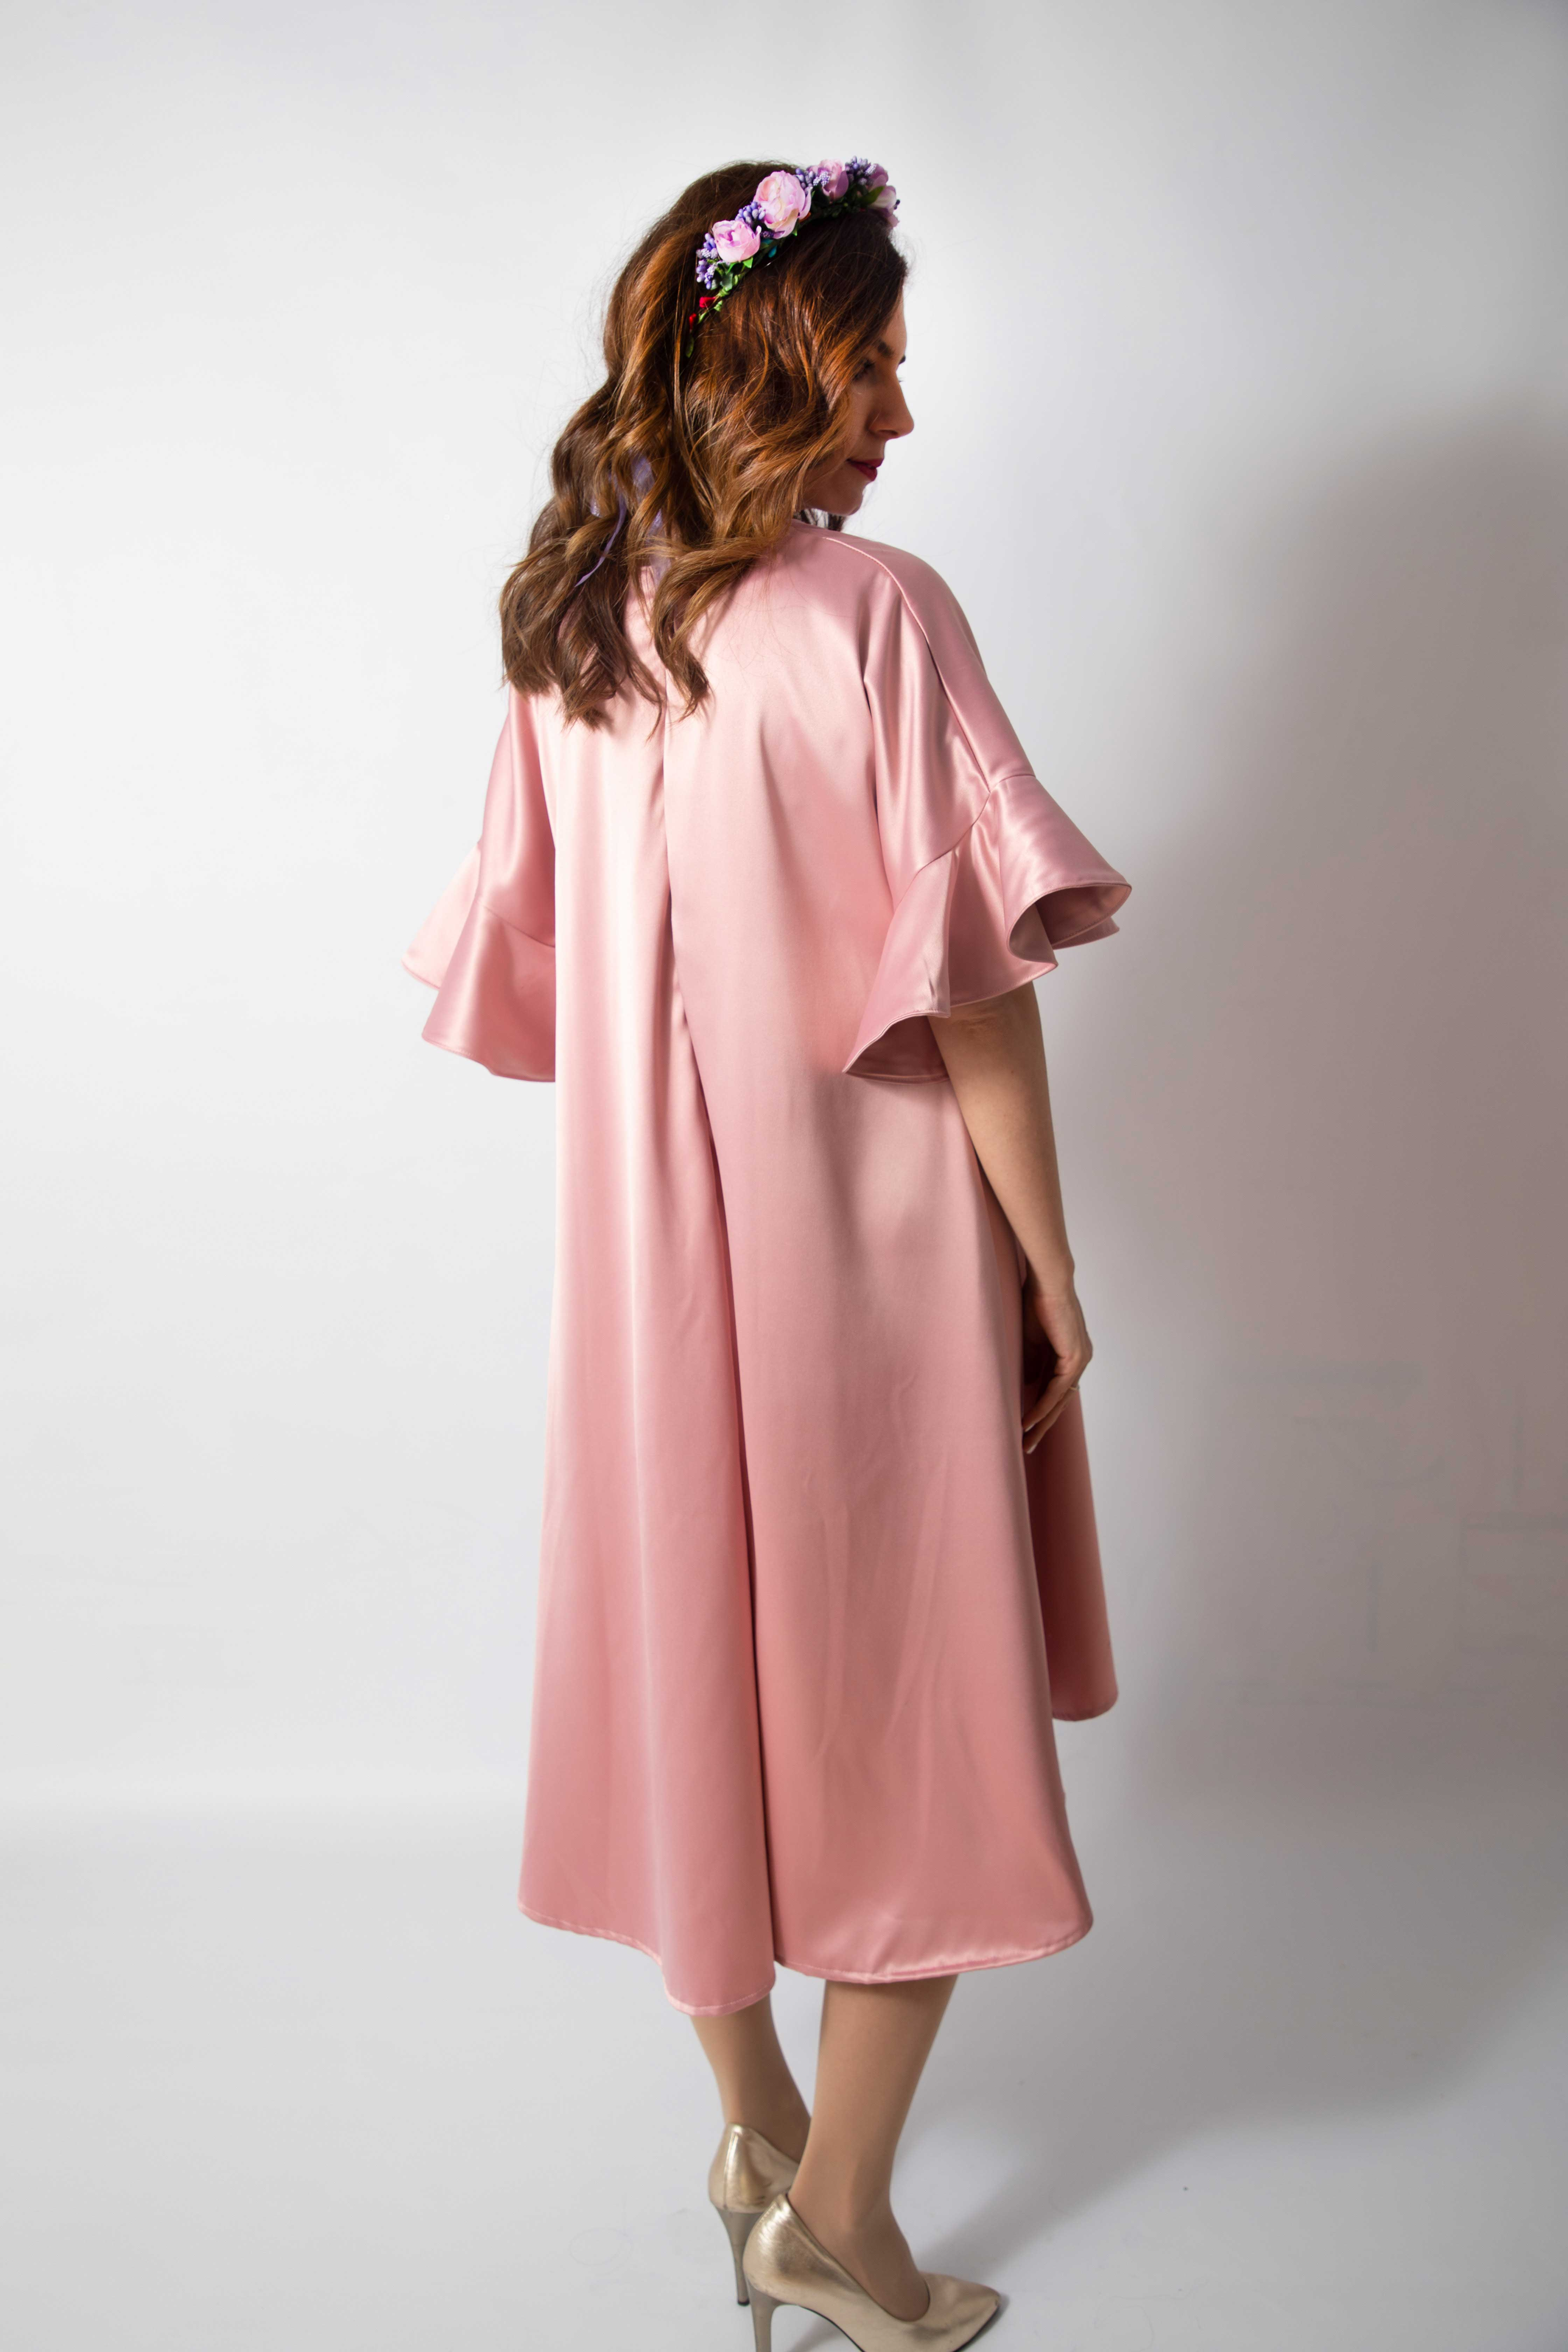 champagne-blush-rochie-super-eleganta-gravida-produsa-in-romania 3